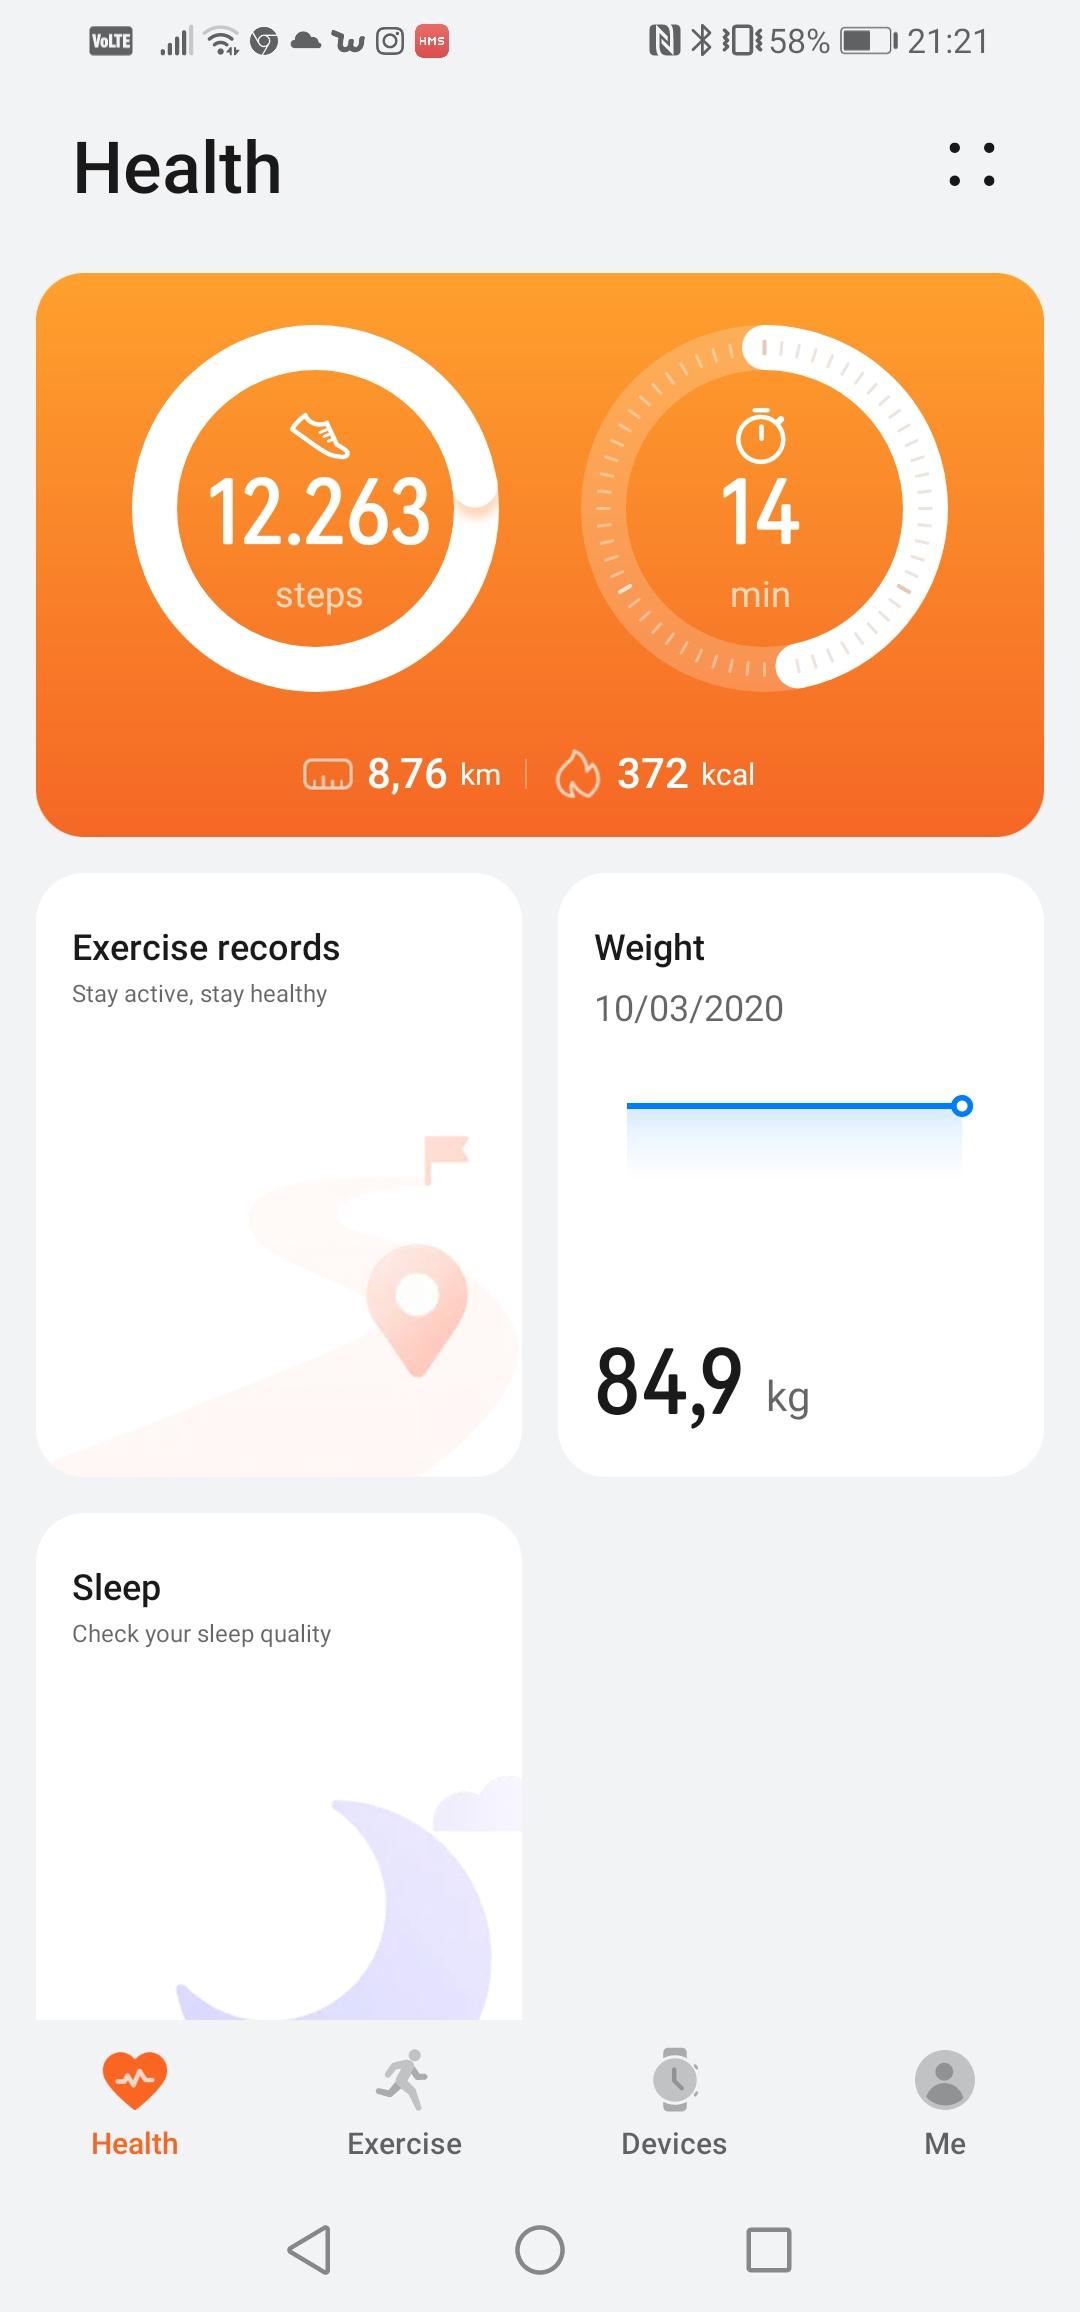 screenshot_20210516_212121_com-huawei-health